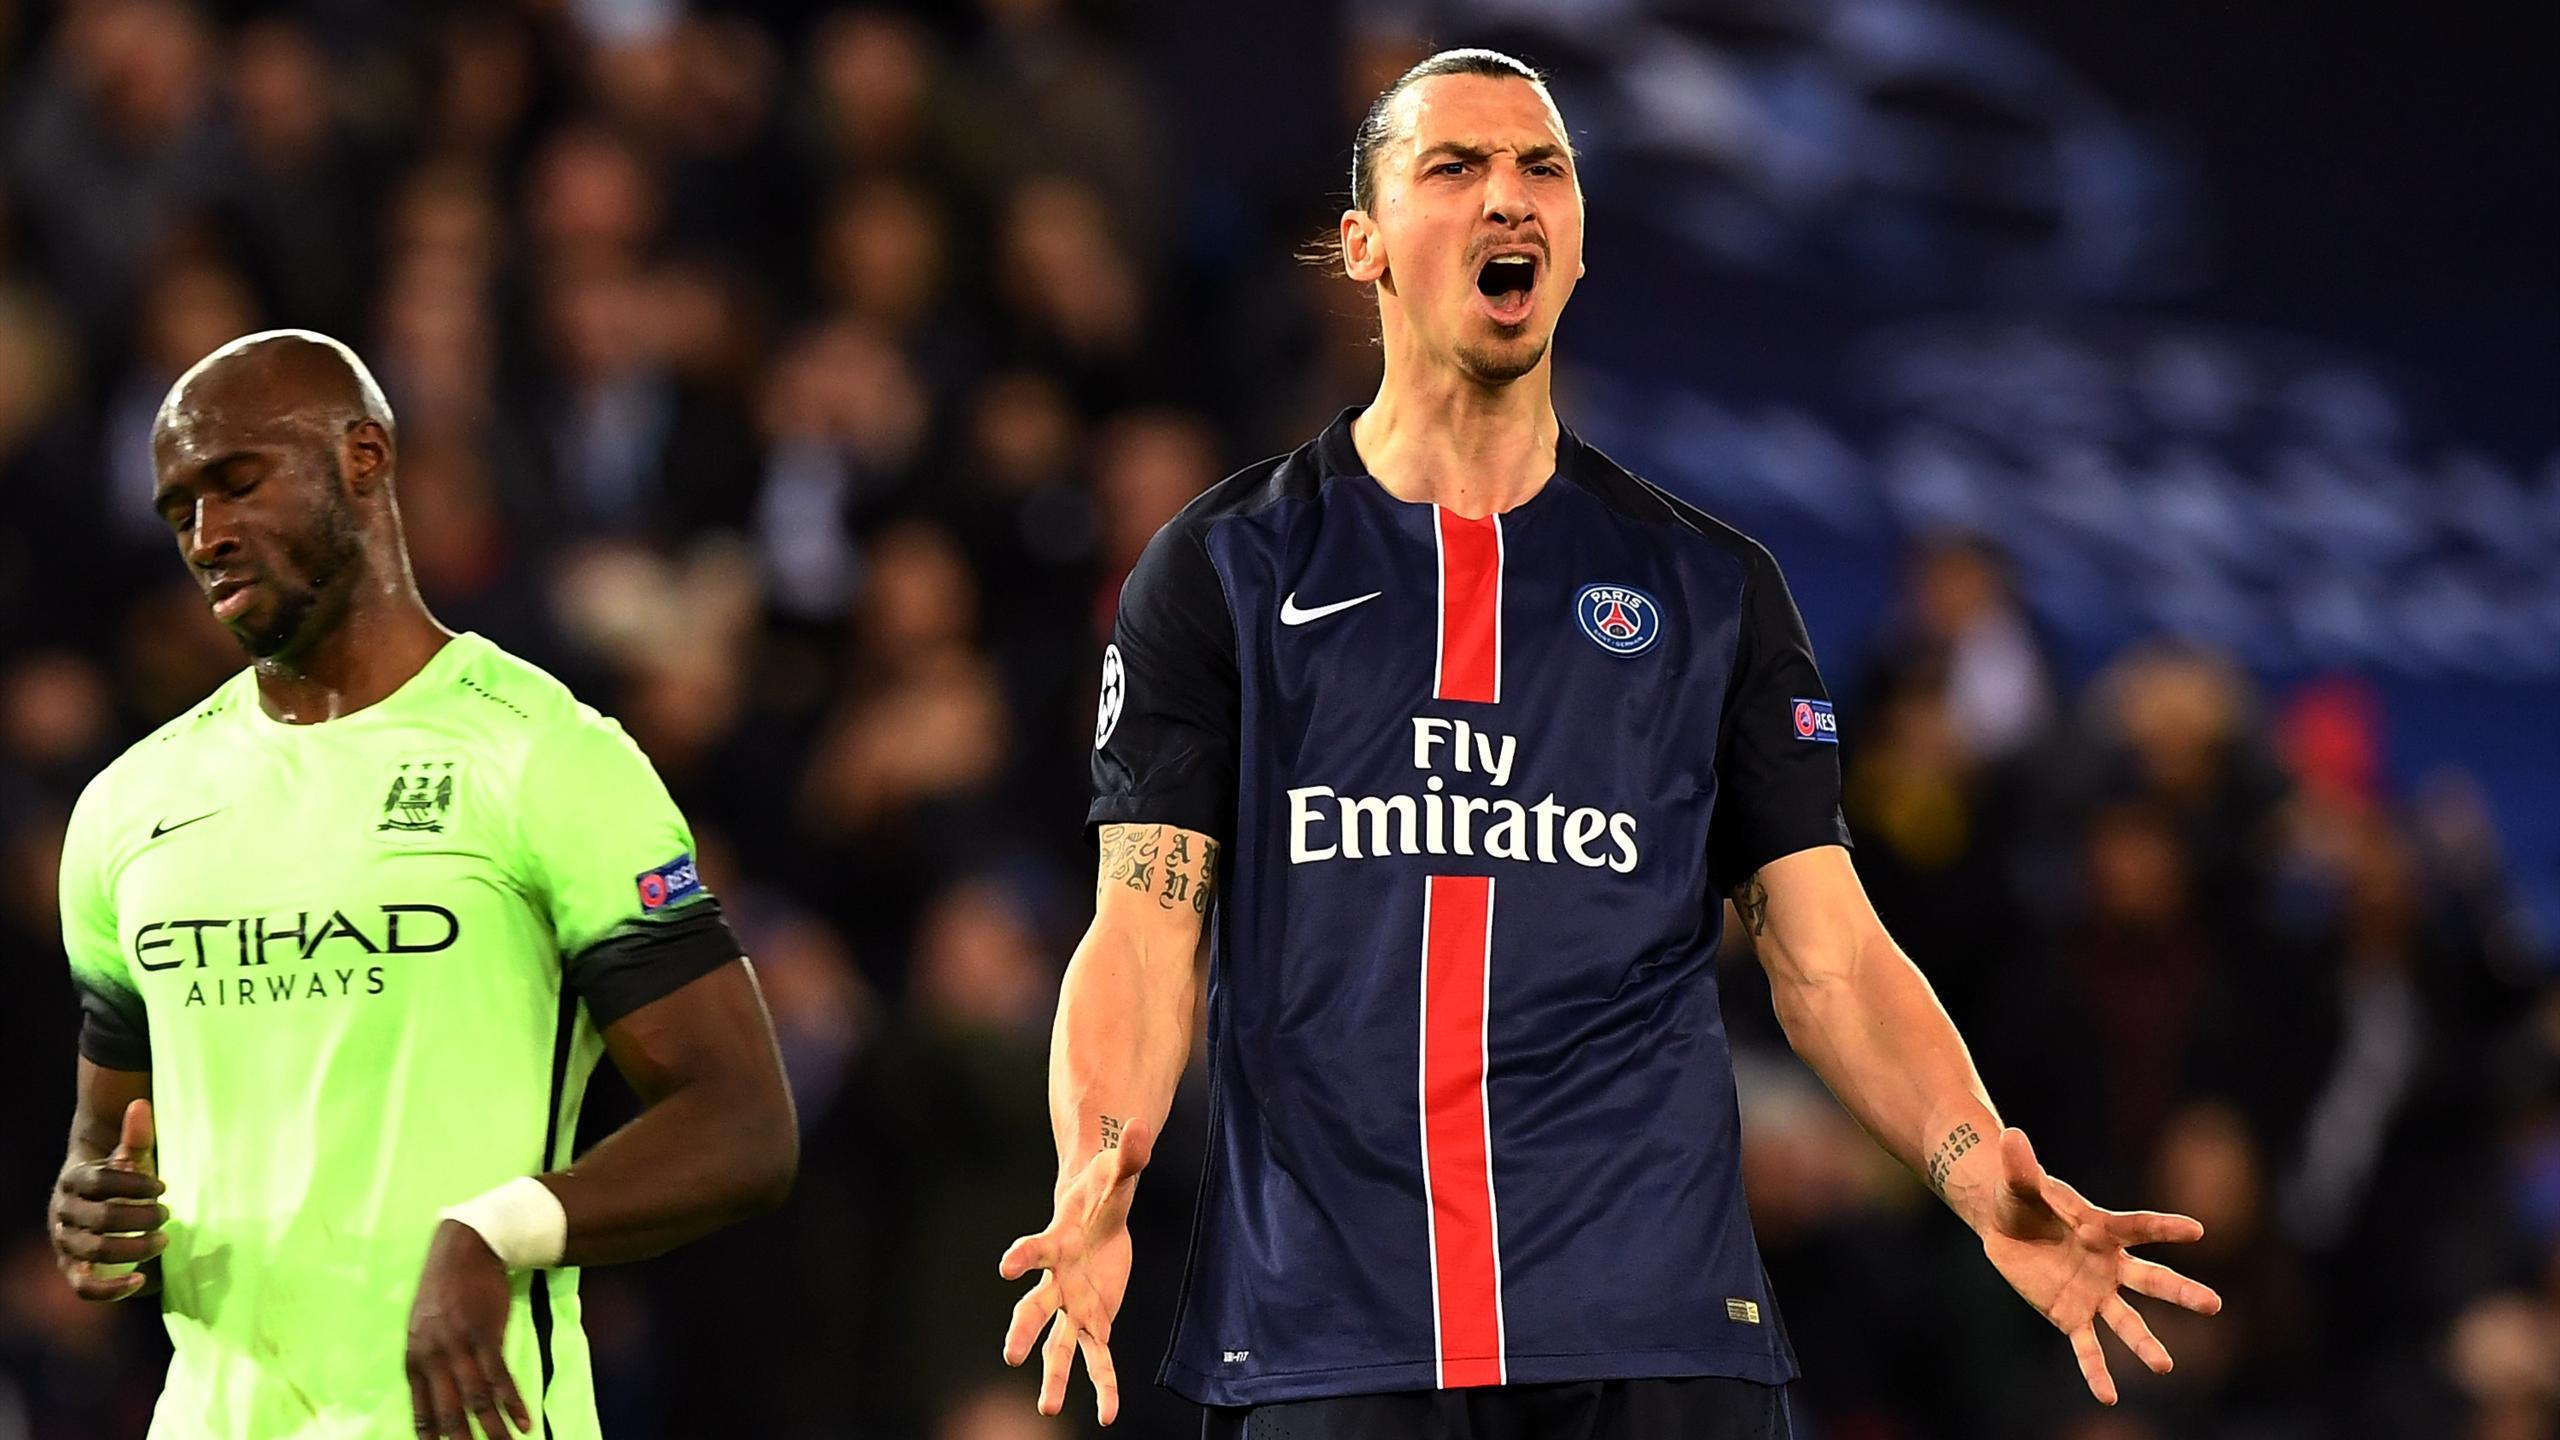 Paris Saint-Germain's Swedish forward Zlatan Ibrahimovic reacts to a missed shot